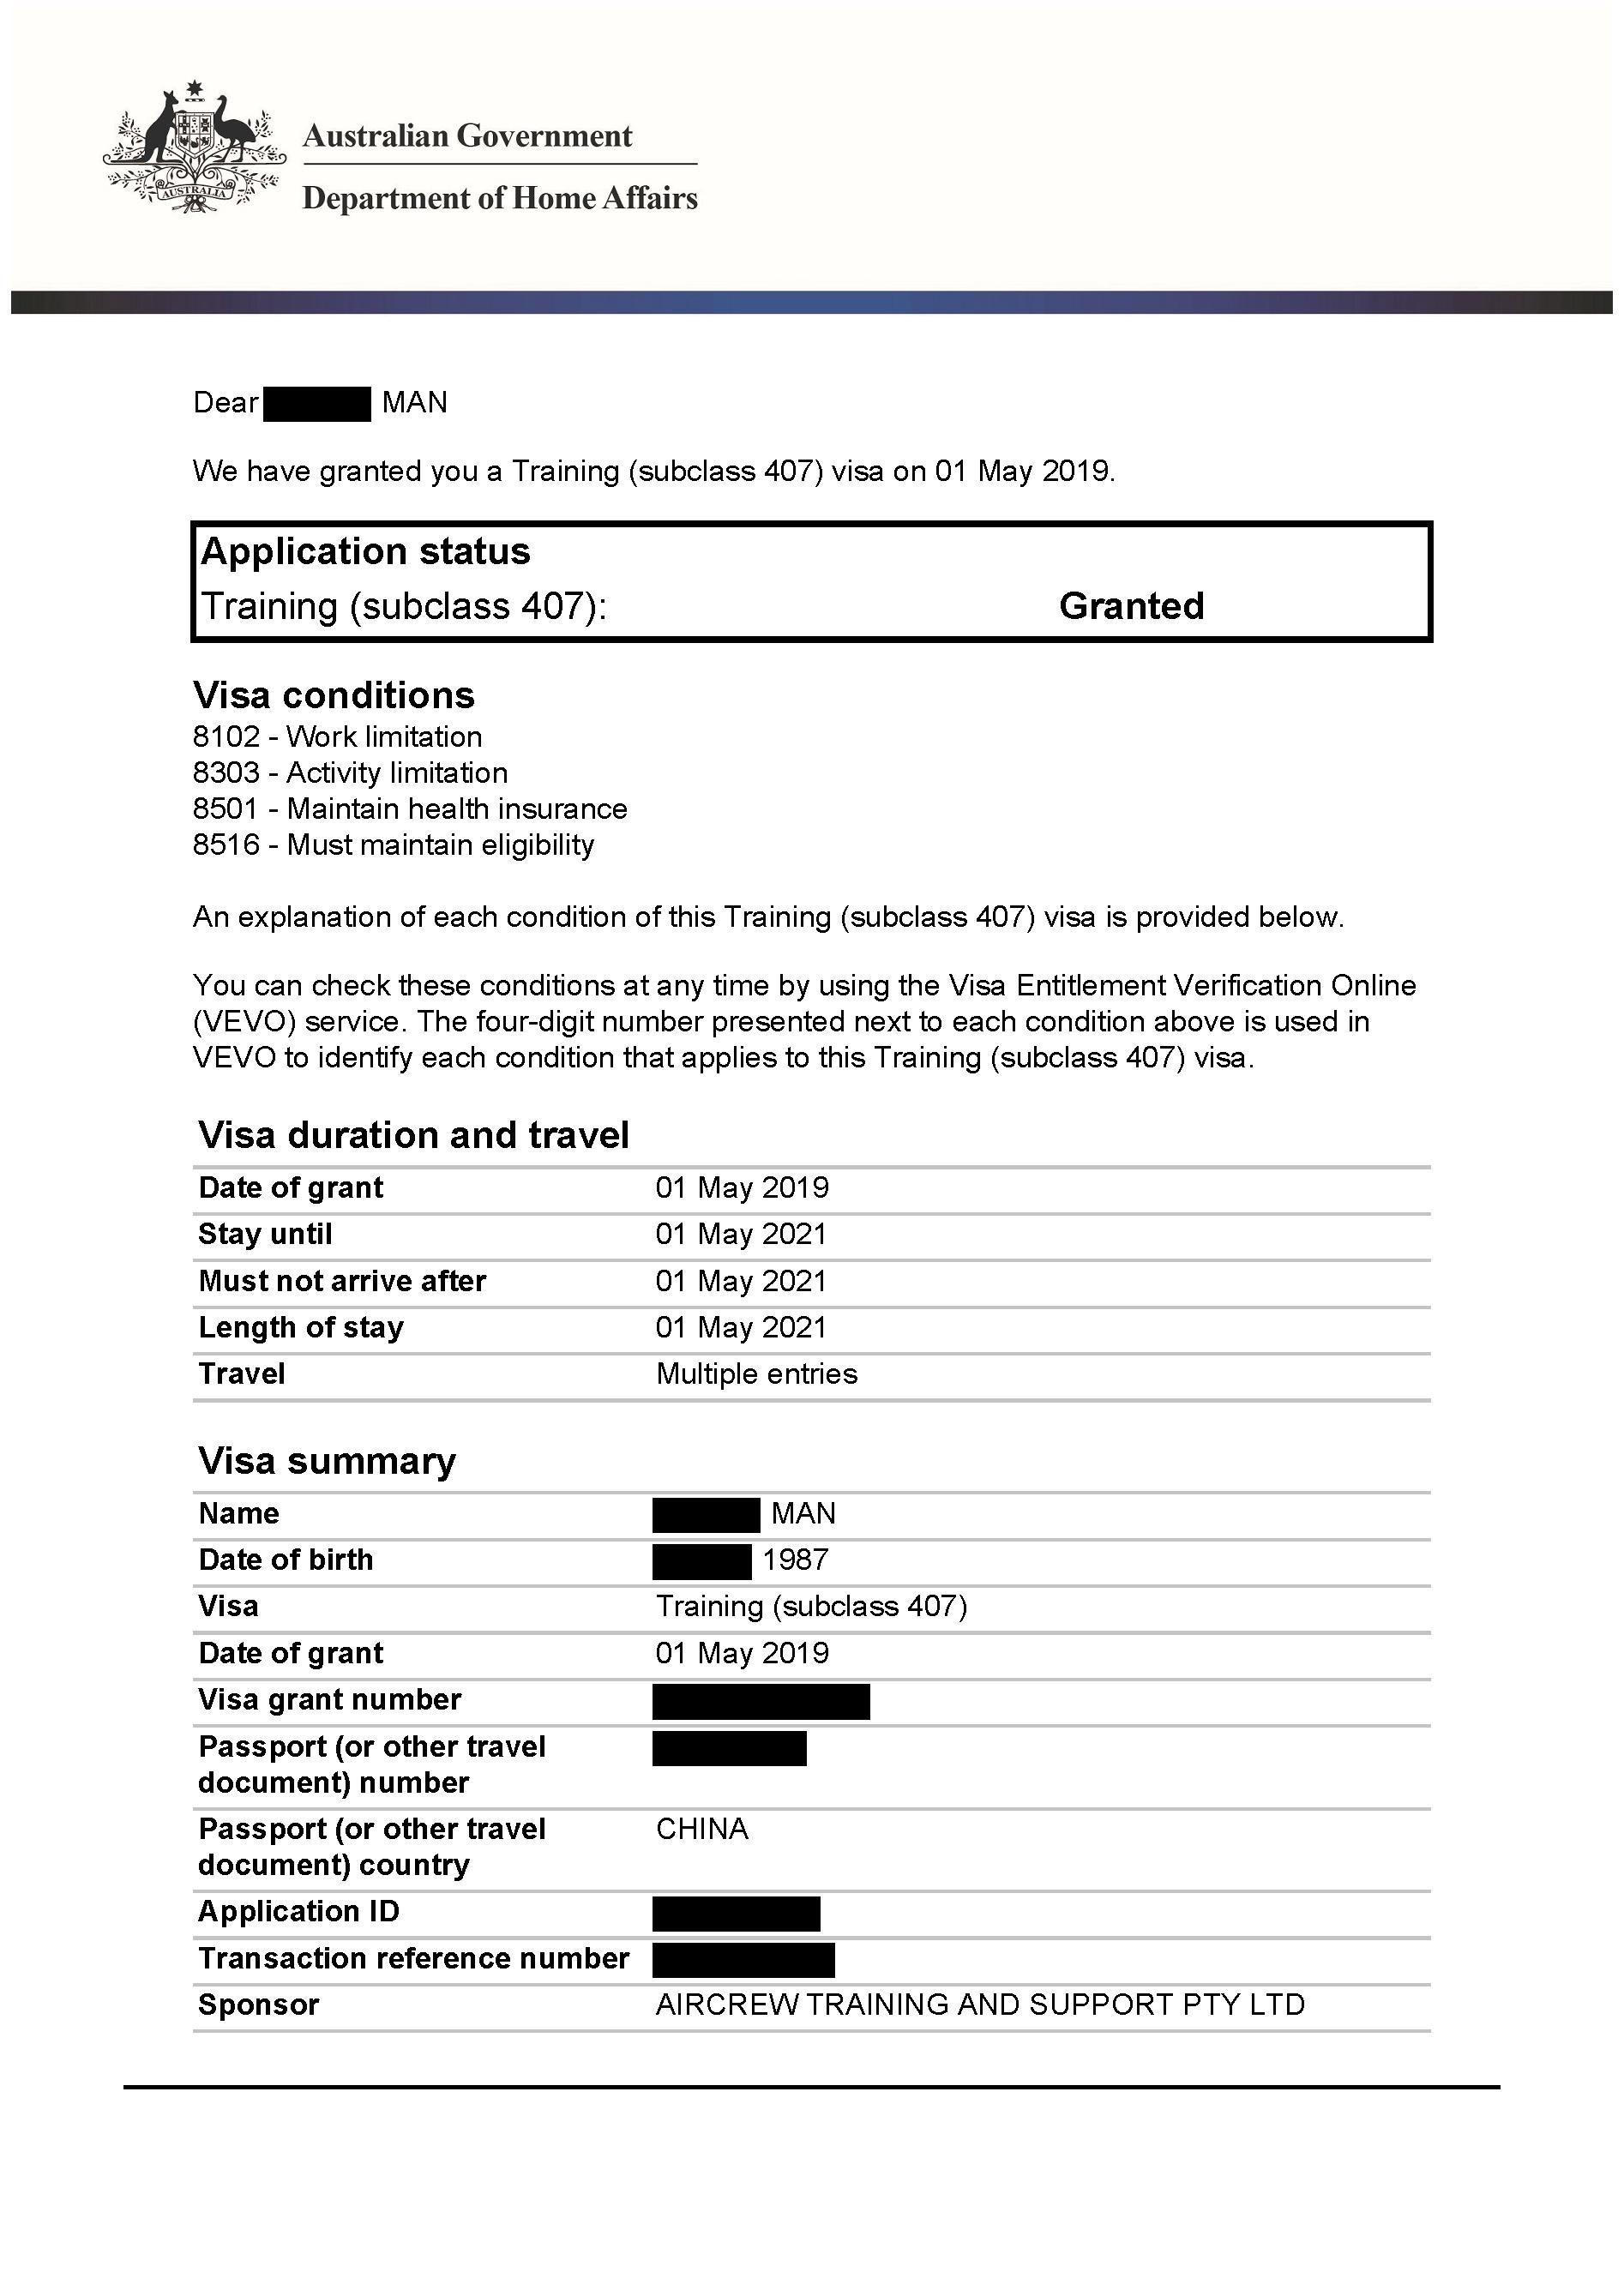 IMMI Grant Notification – 407 Man_Redacted